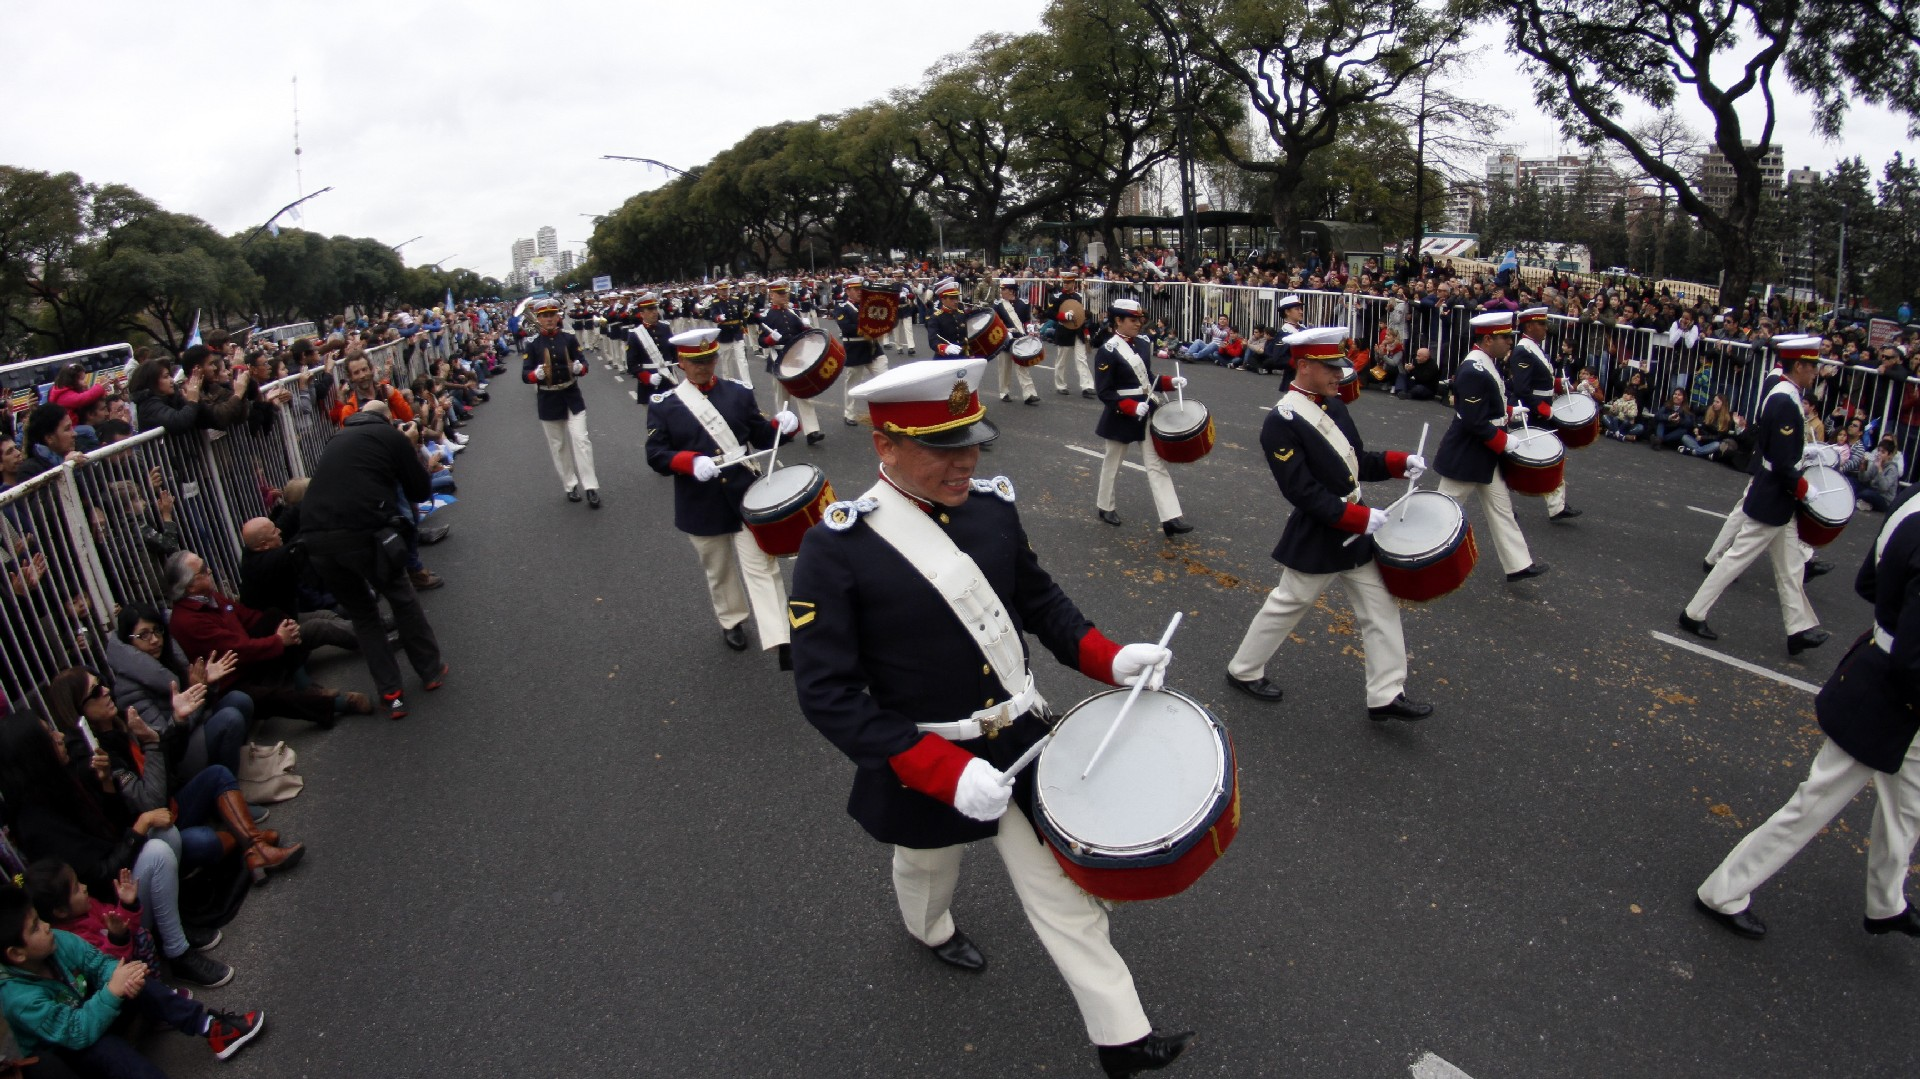 Desfile glbt por las calles de centro historico - 2 1